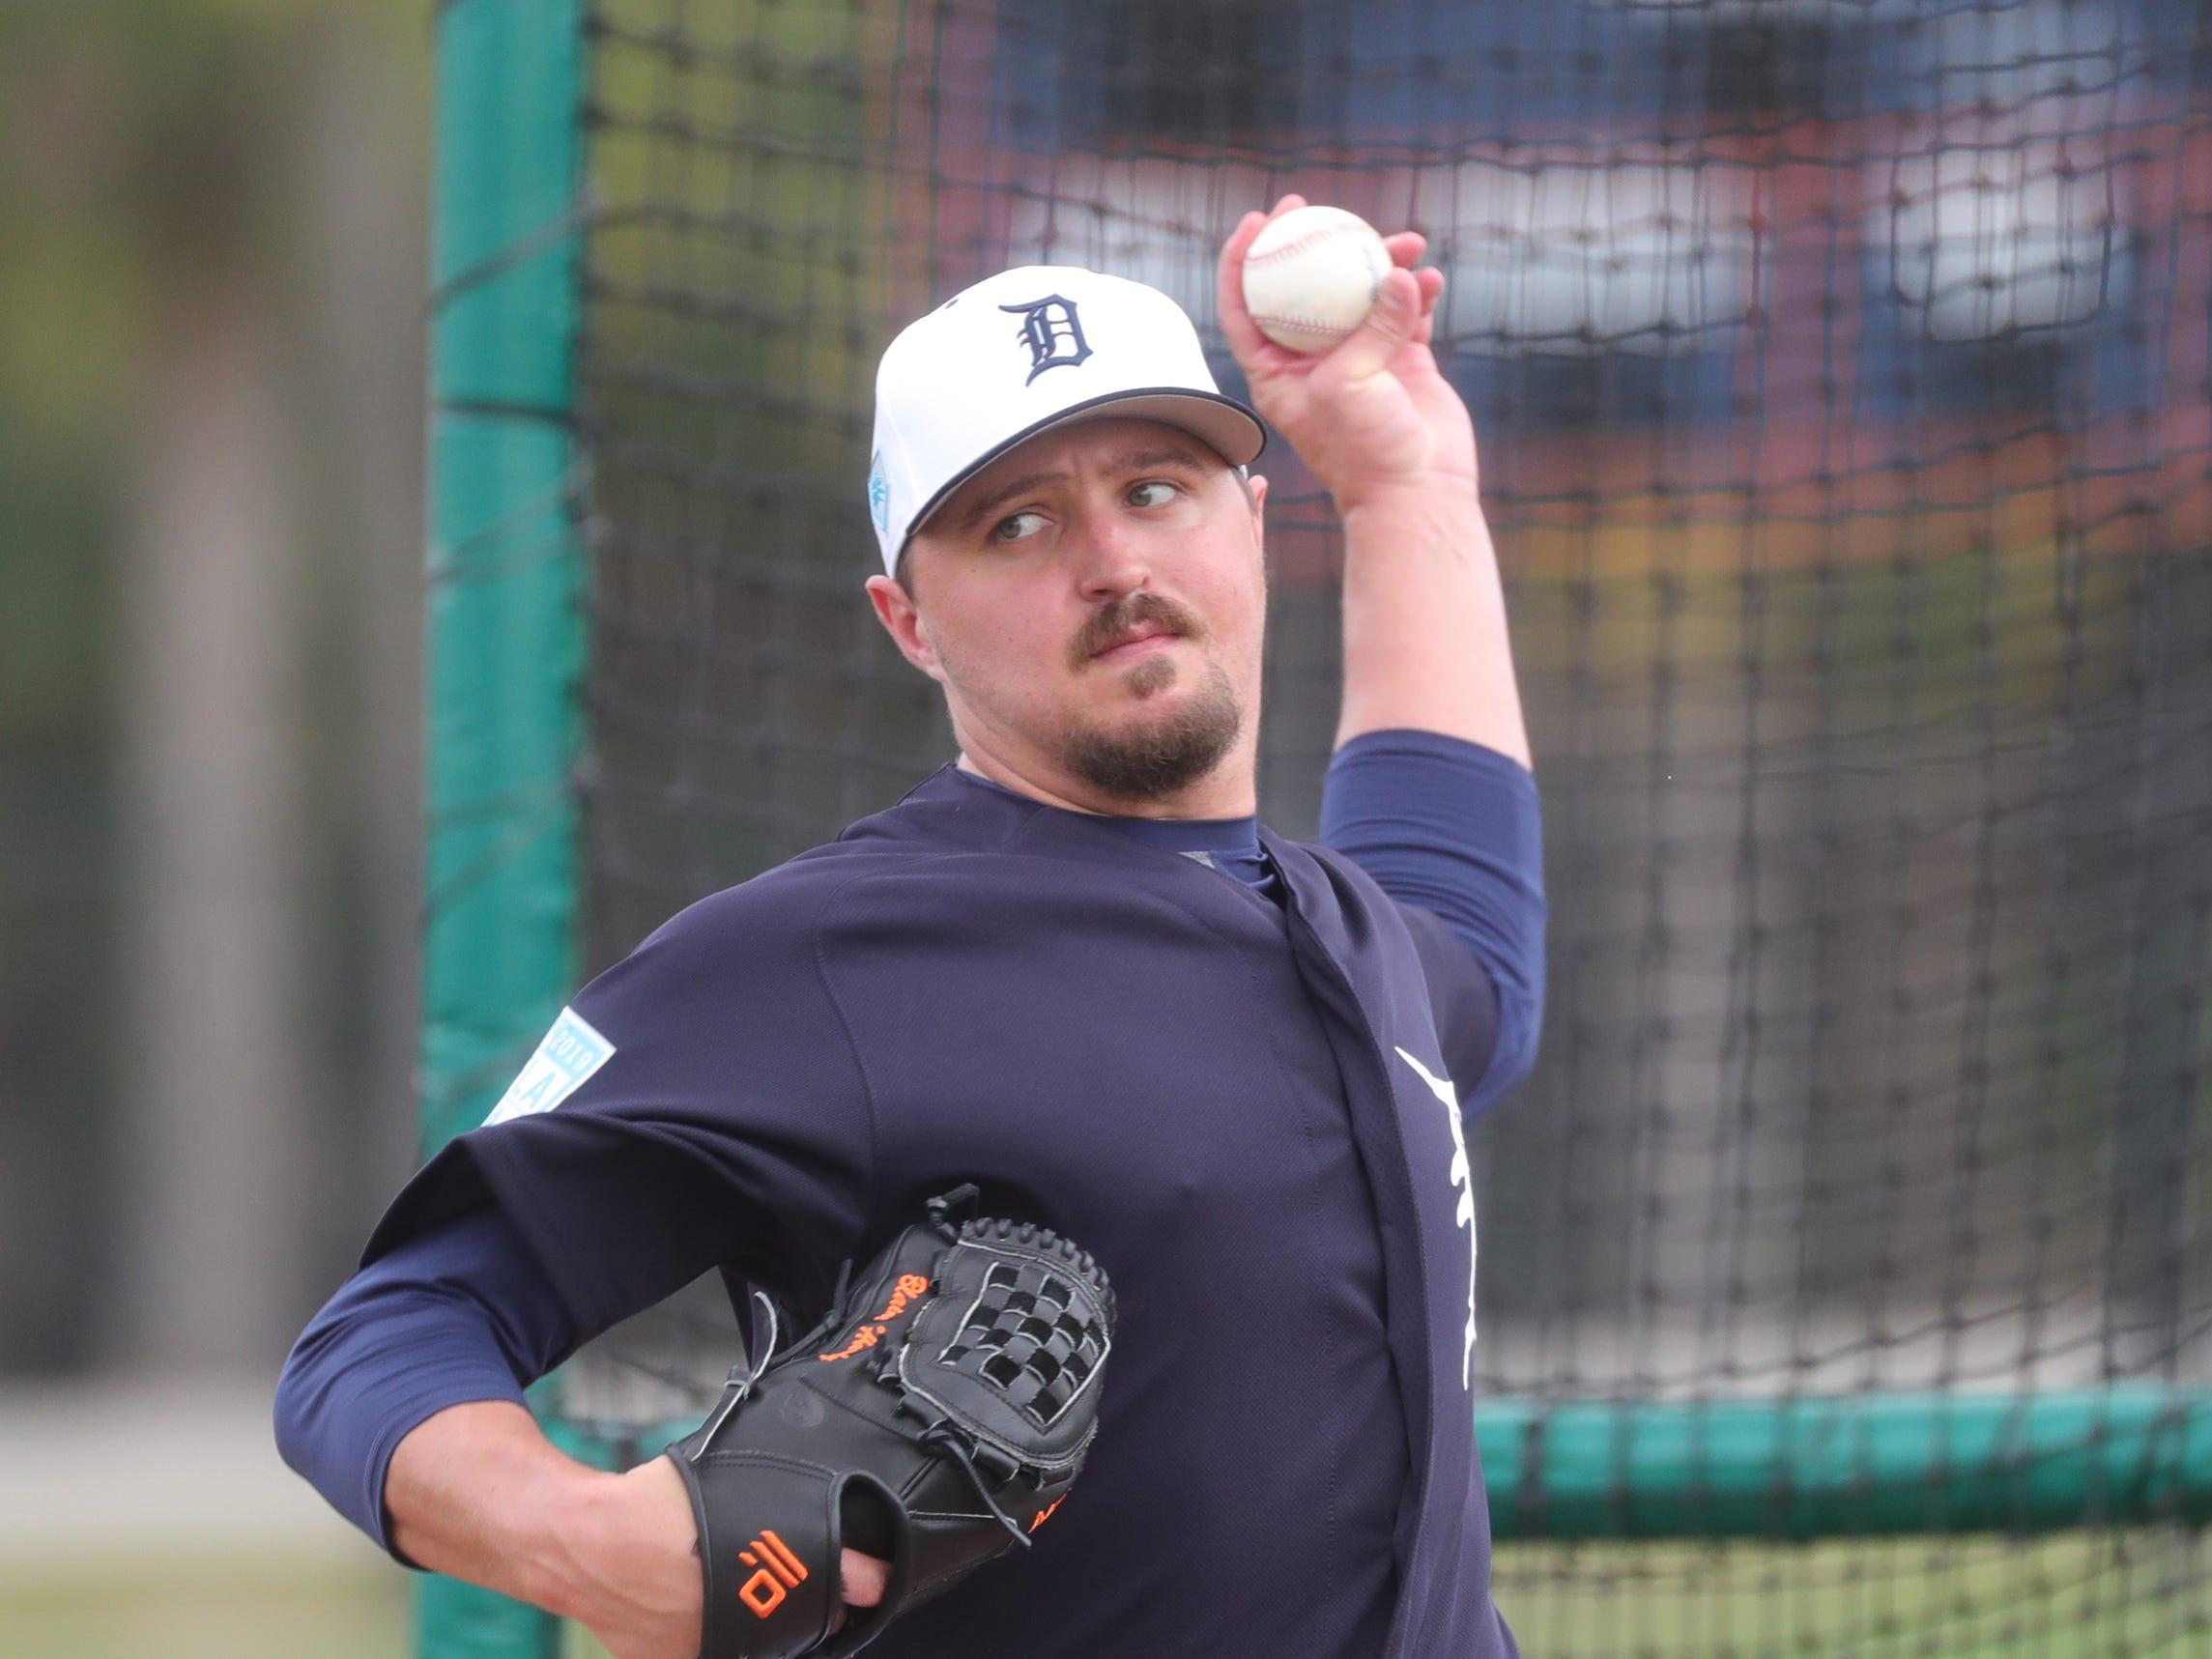 Detroit Tigers pitcher Blaine Hardy throws batting practice Monday, Feb. 18, 2019 at Joker Marchant Stadium in Lakeland, Fla.